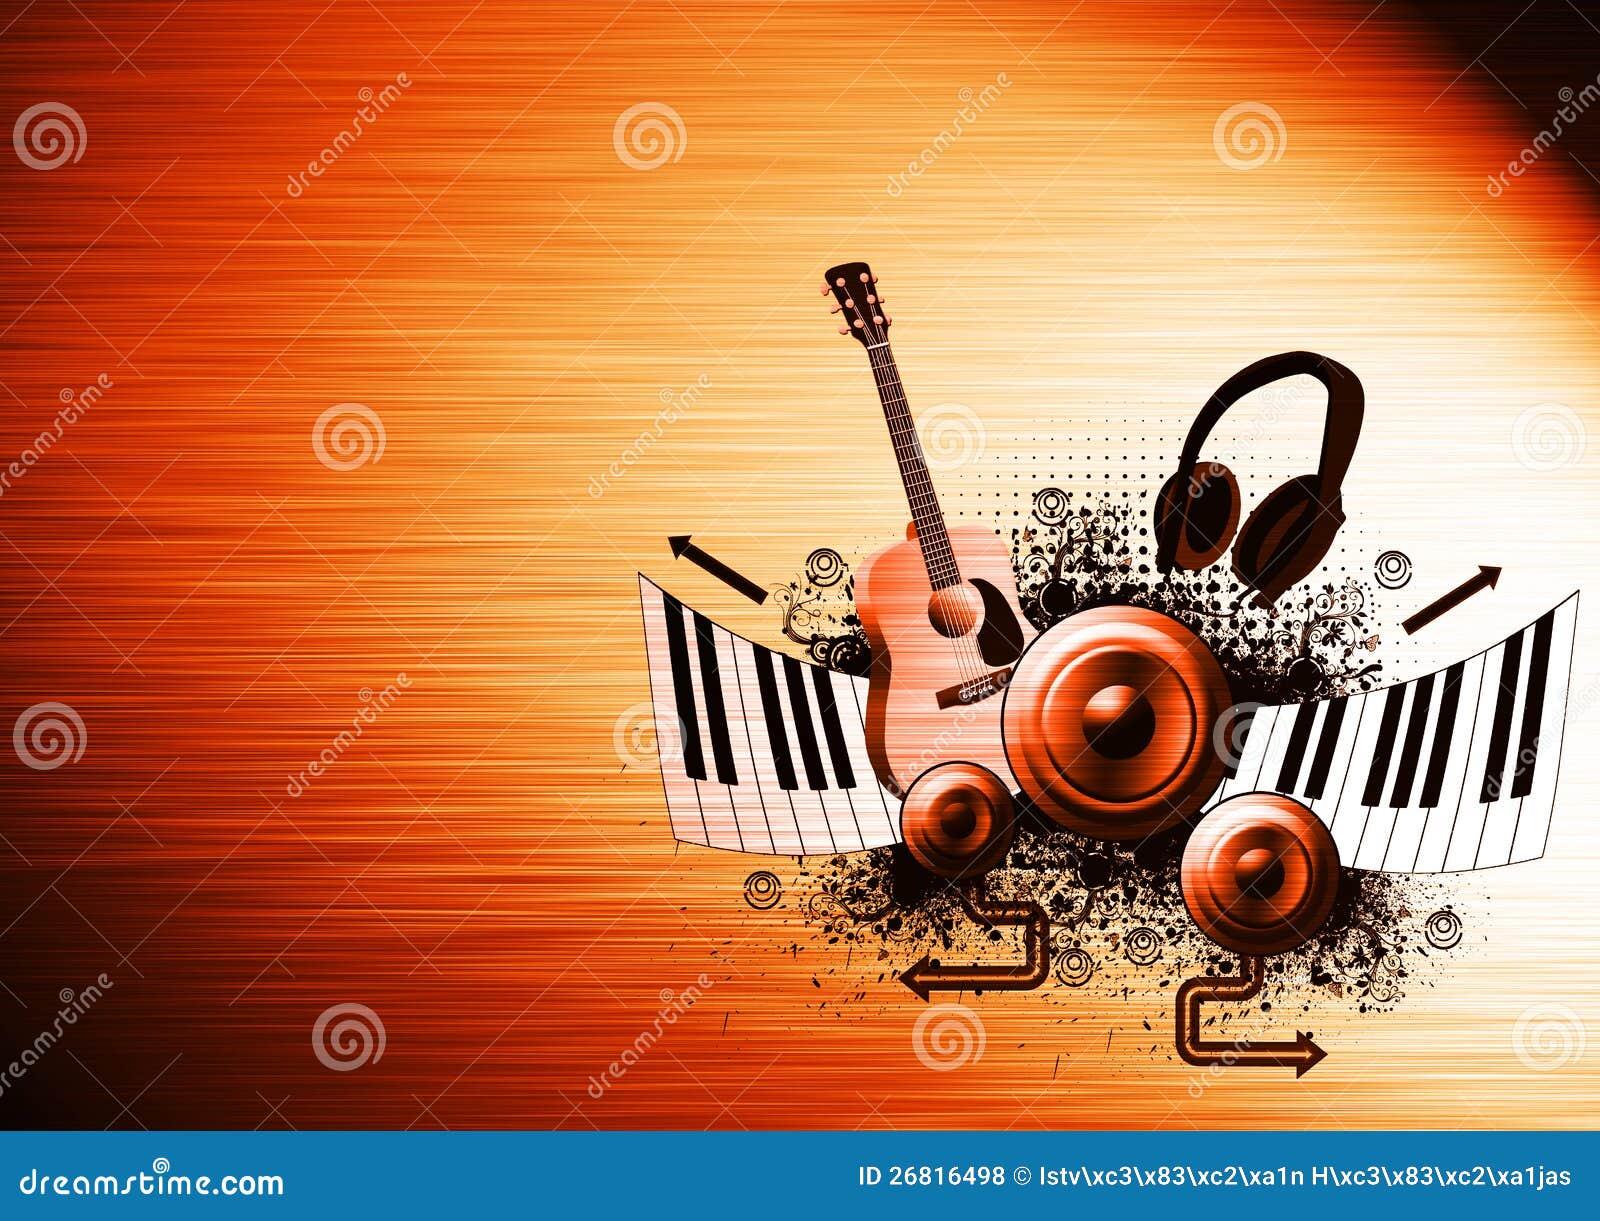 Image Result For Royalty Free Music Folk